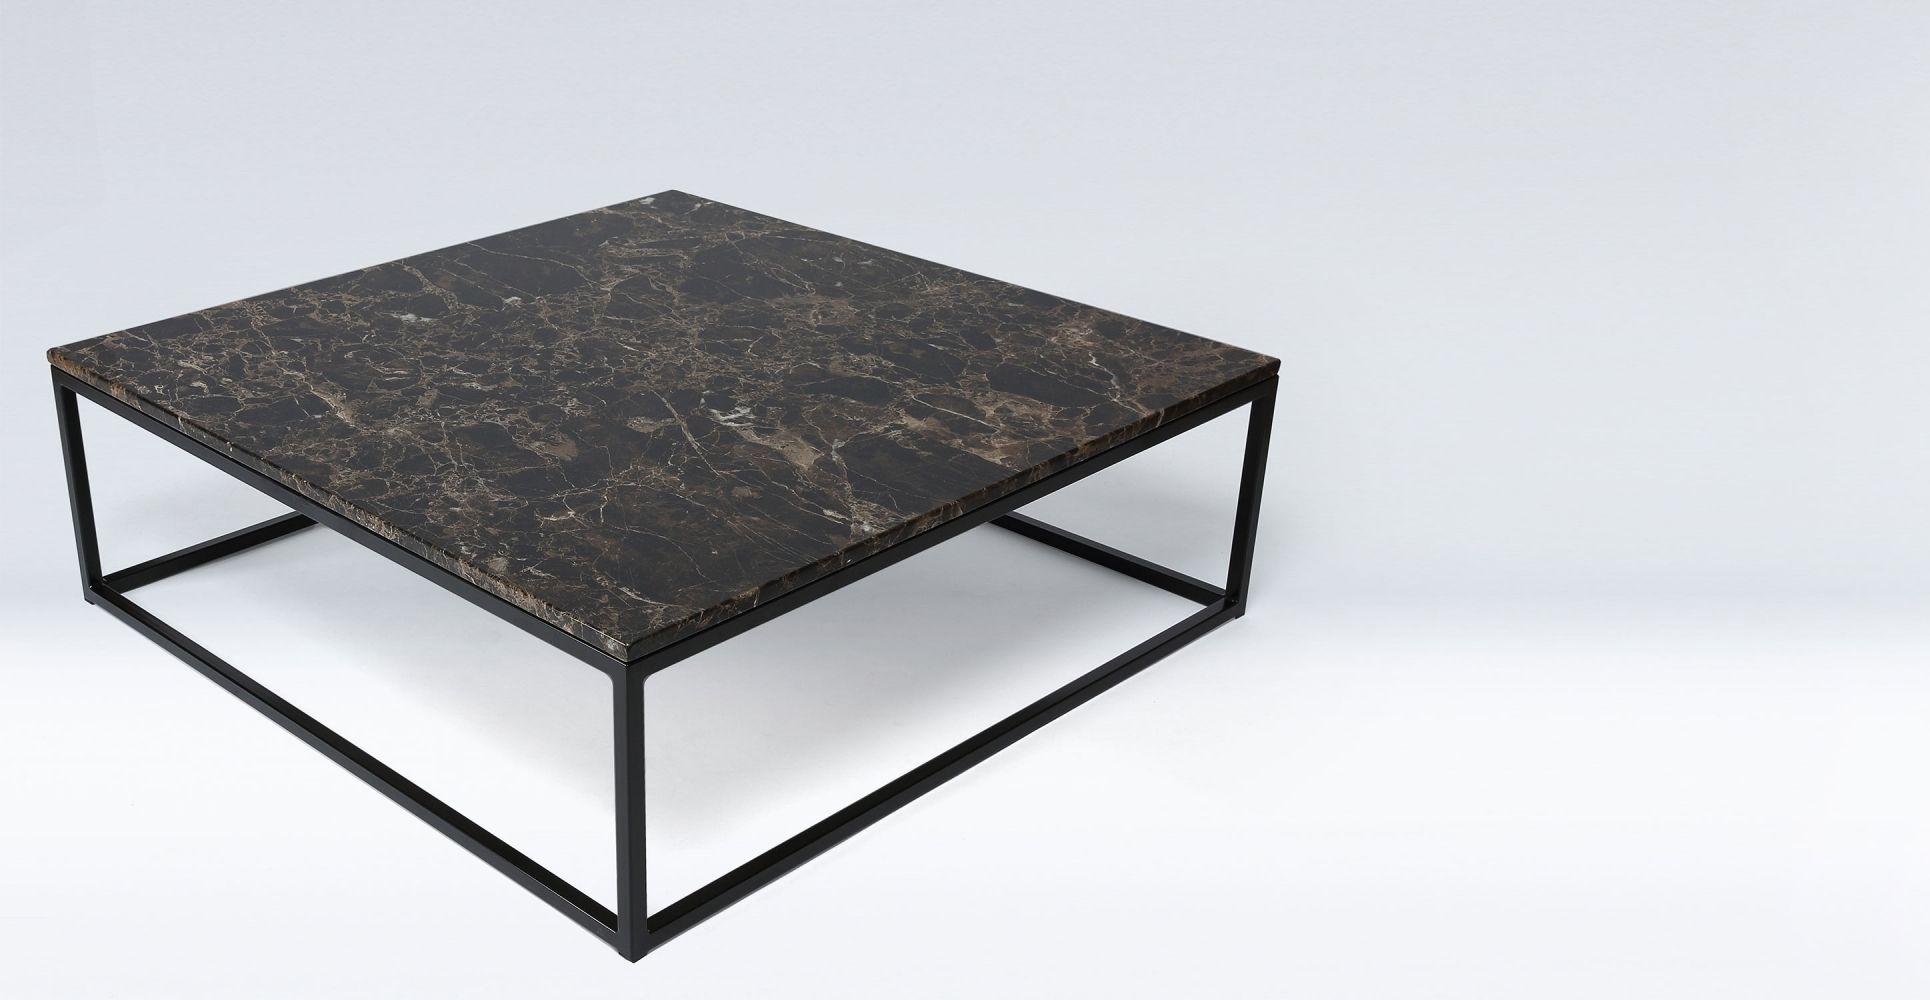 Table Basse Marbre Noir Metal Noir Smoke Table Basse Marbre Table Basse Marbre Noir